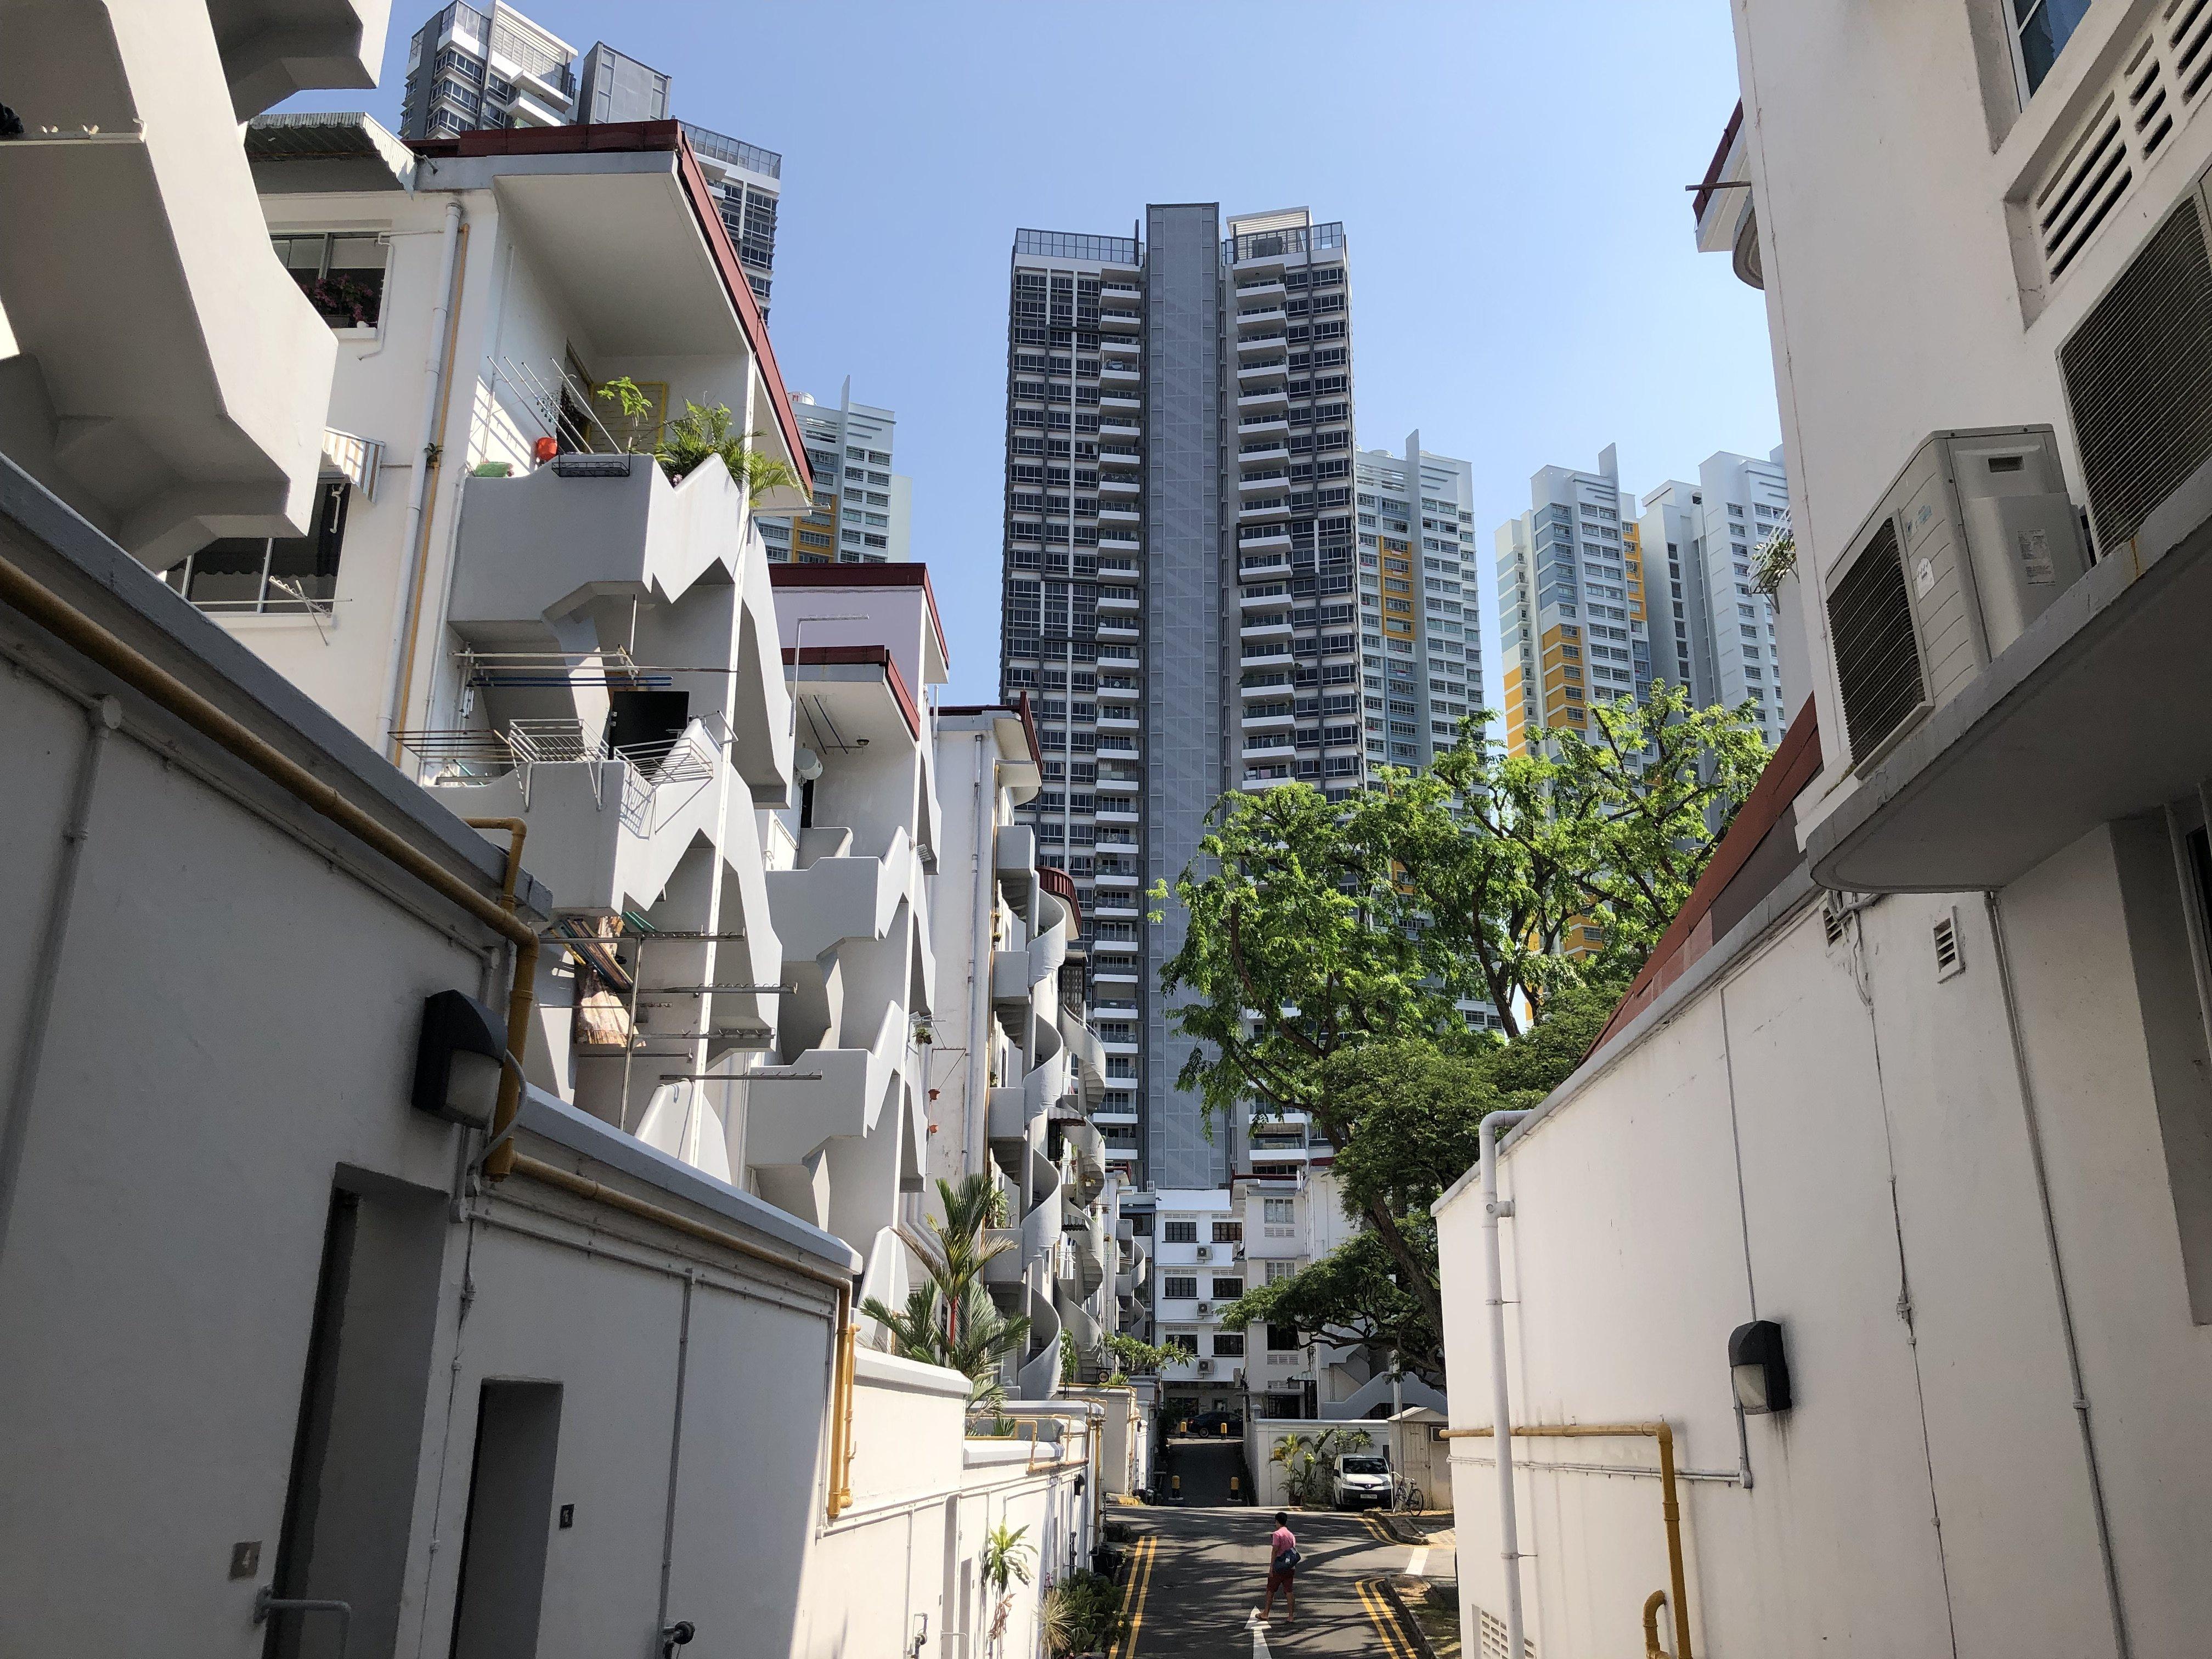 Back Alley in Tiong Bahru